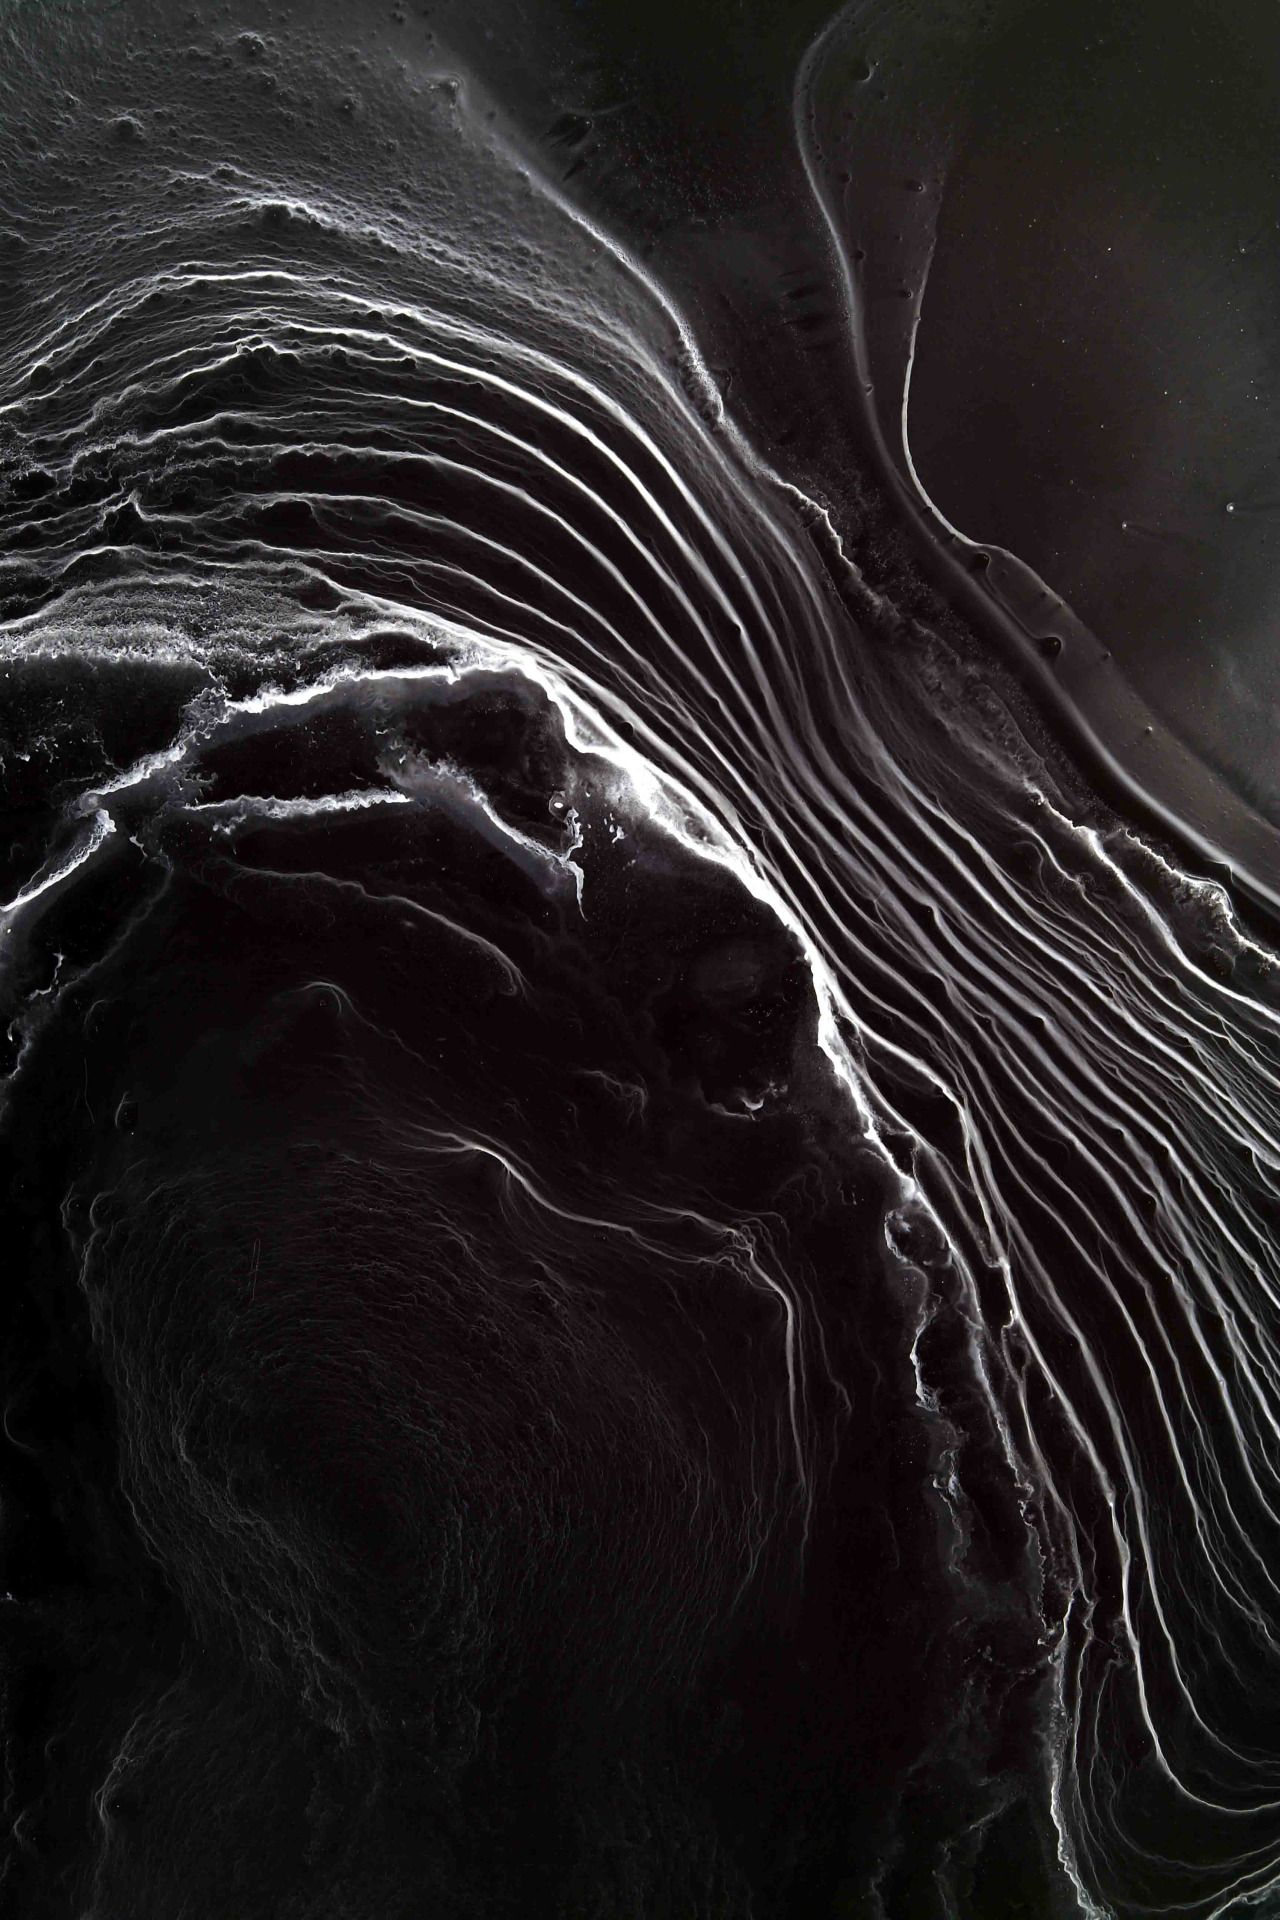 Black fluid texture pattern fluidistic textures wave